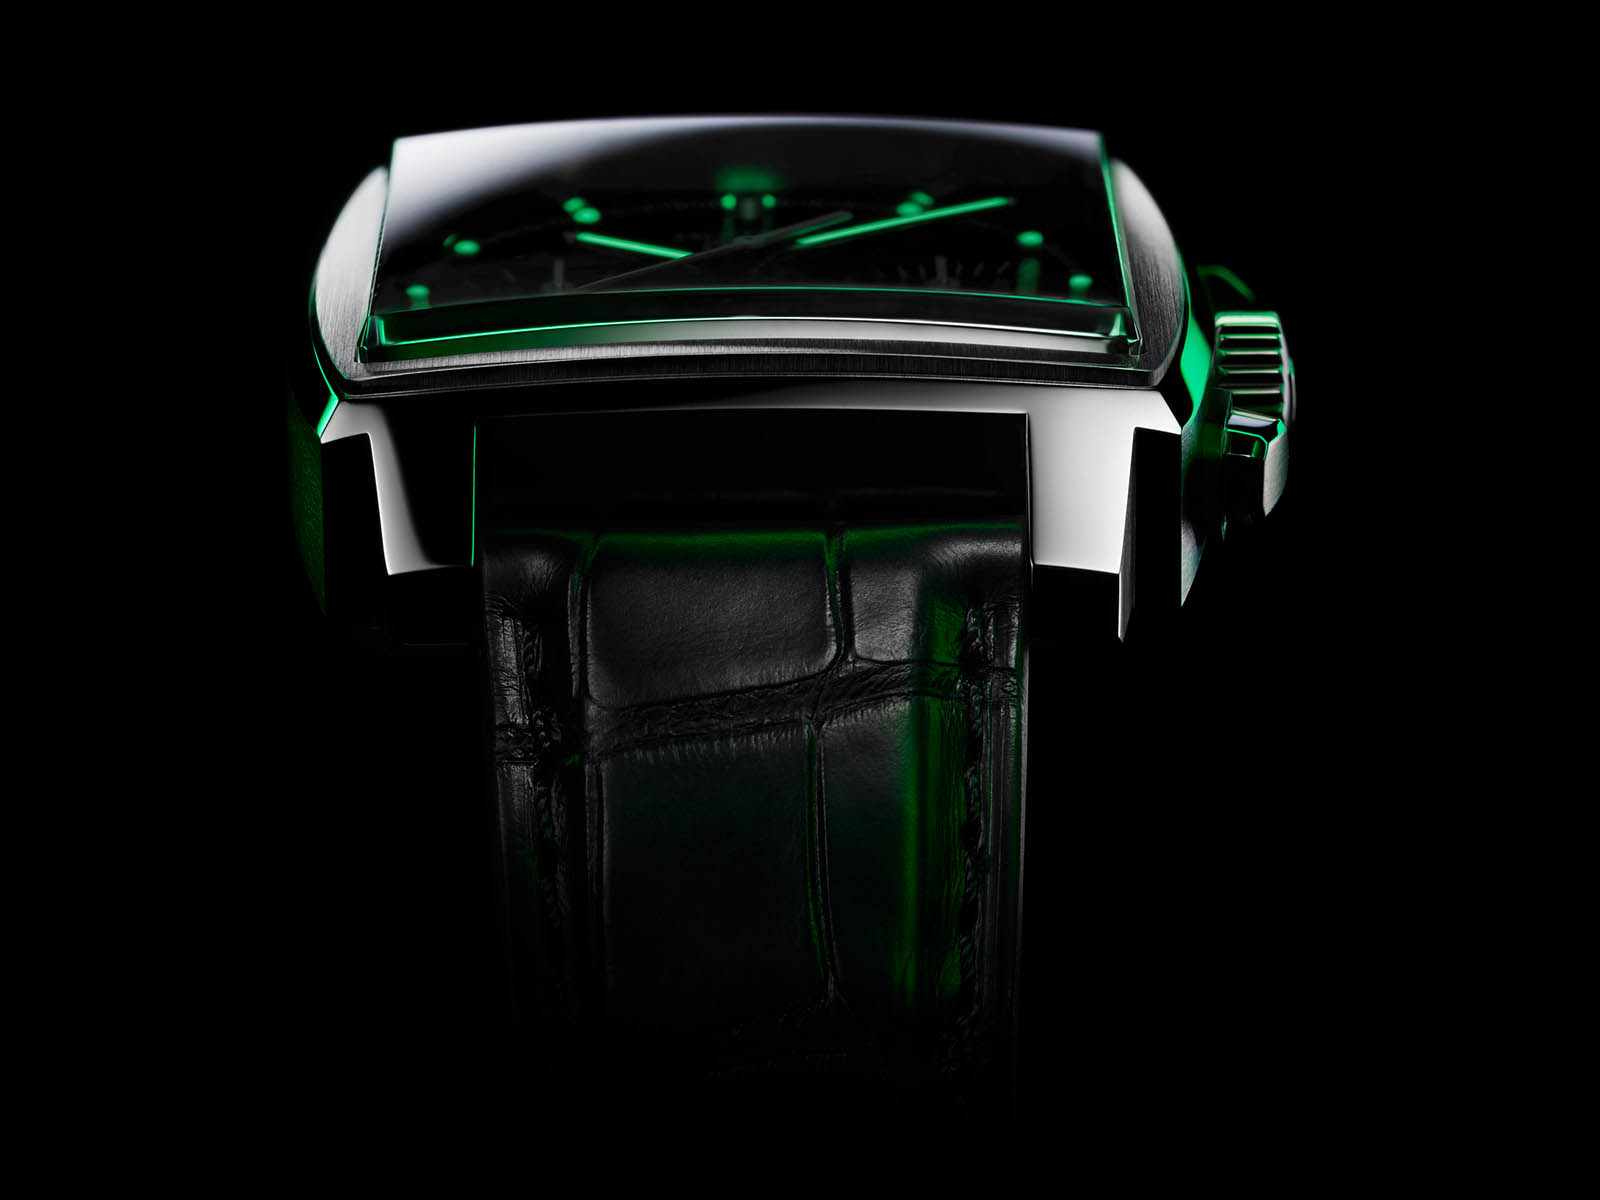 cbl2116-fc6497-tag-heuer-monaco-green-dial-calibre-heuer-02-limited-edition-5.jpg